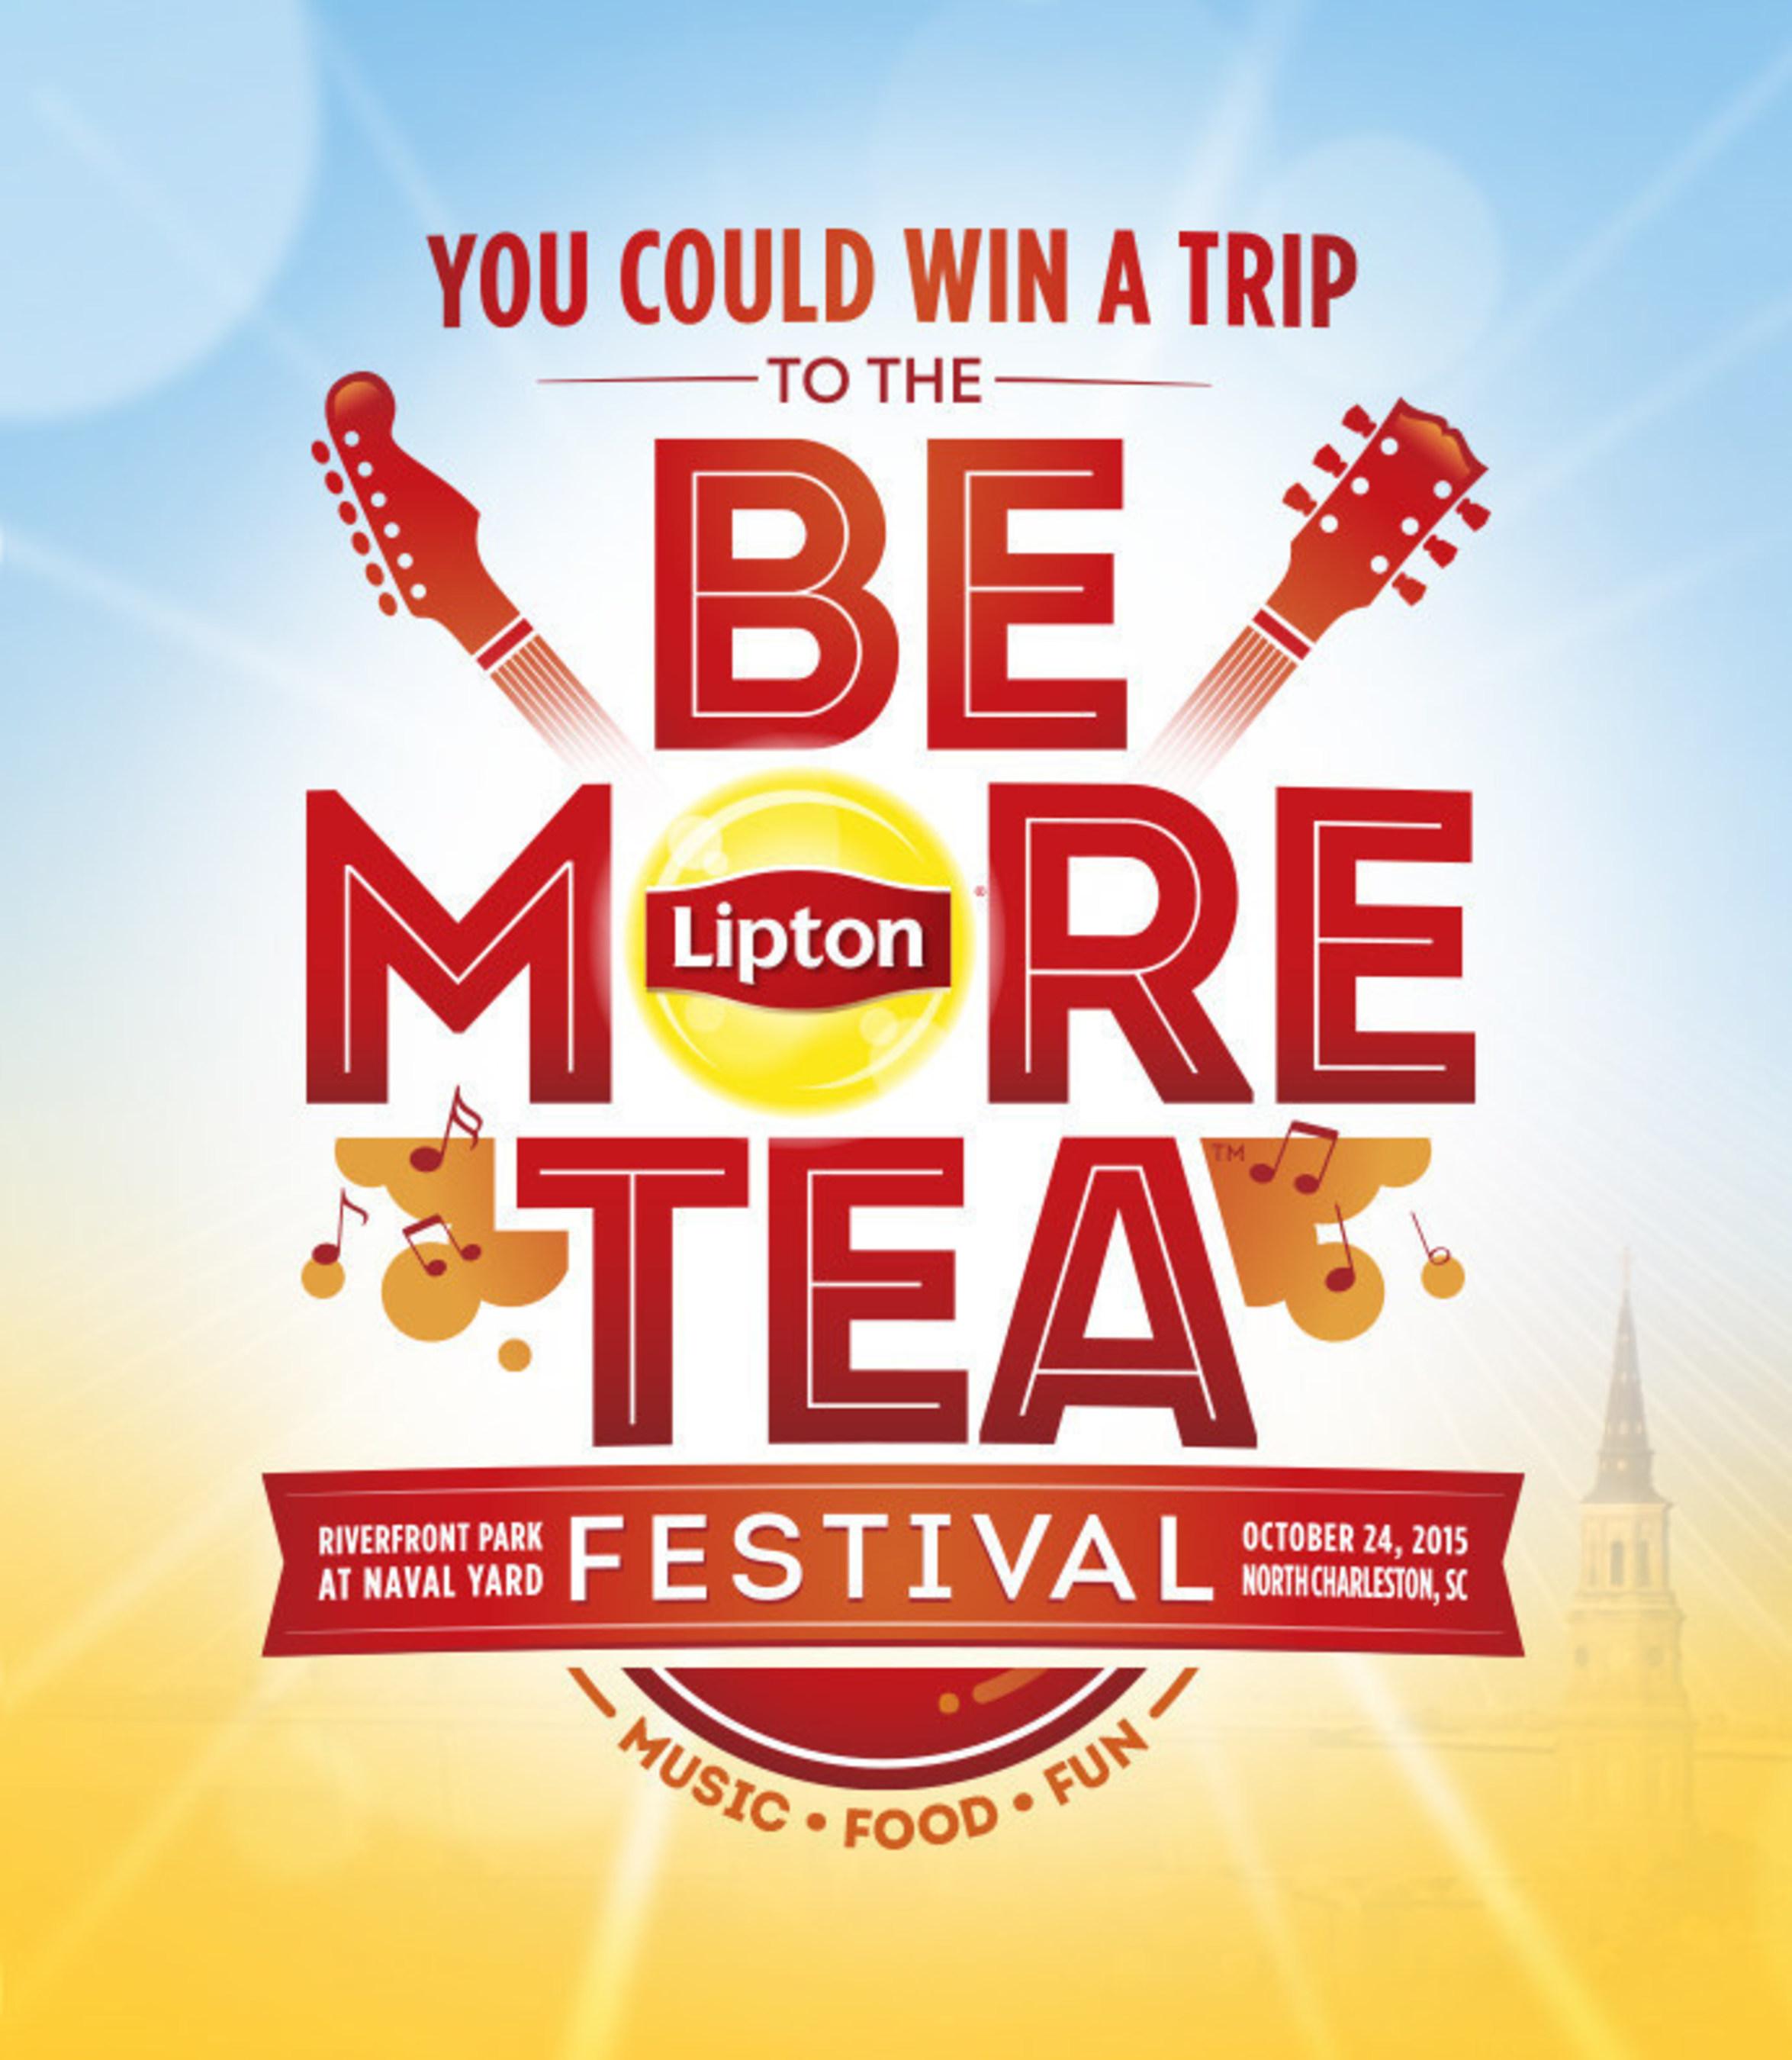 Be More Tea Festival